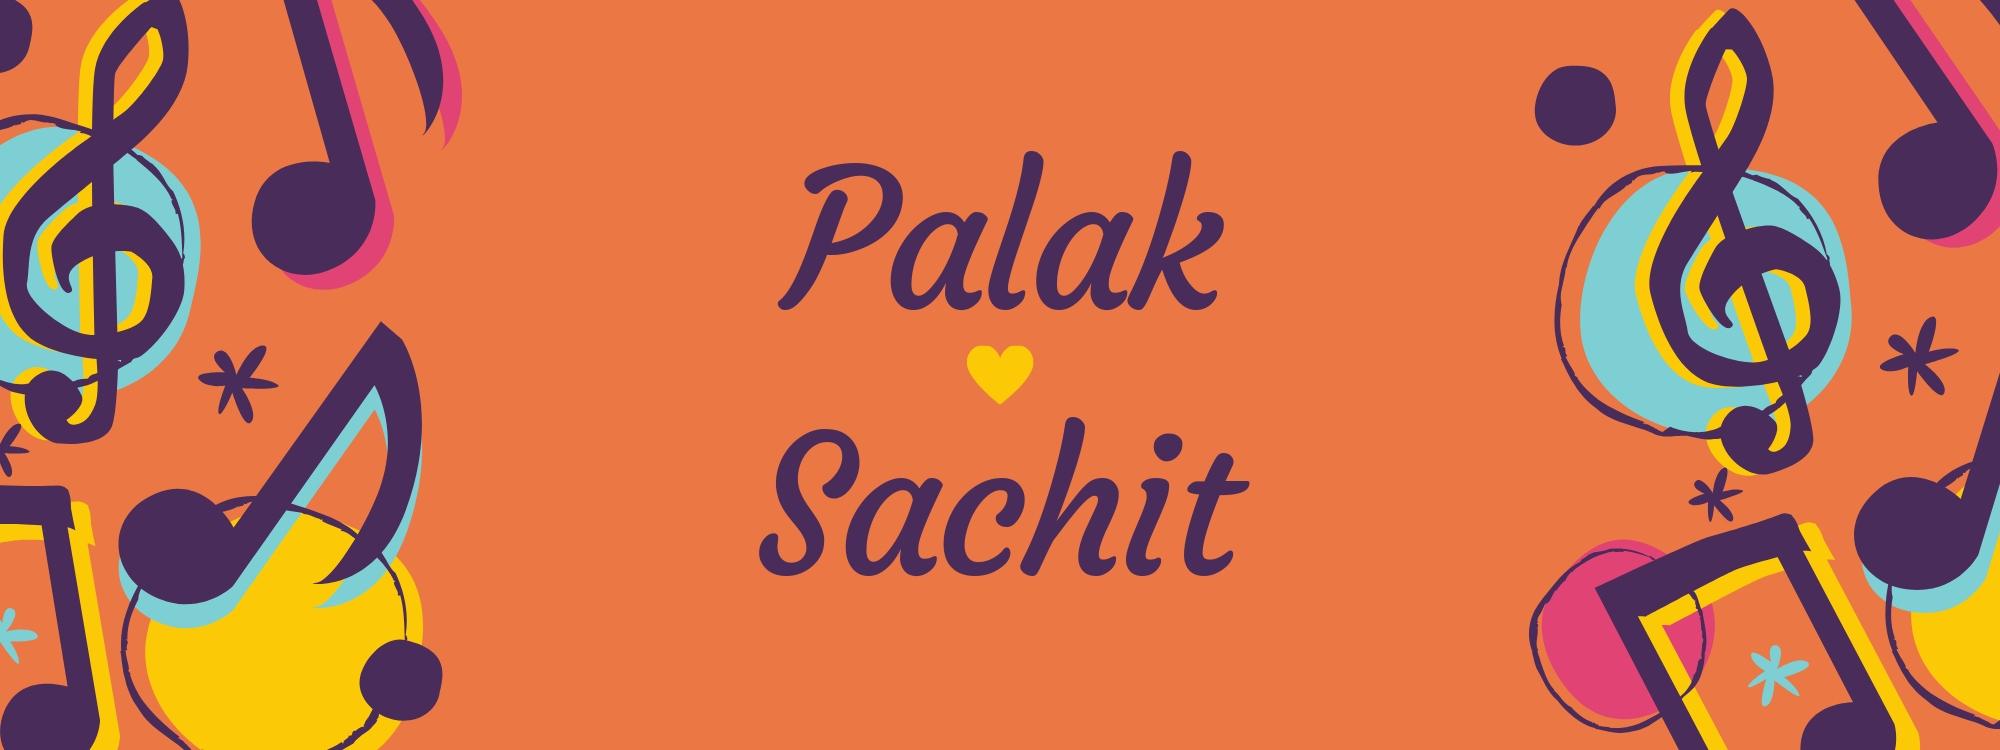 Palak_Sachit